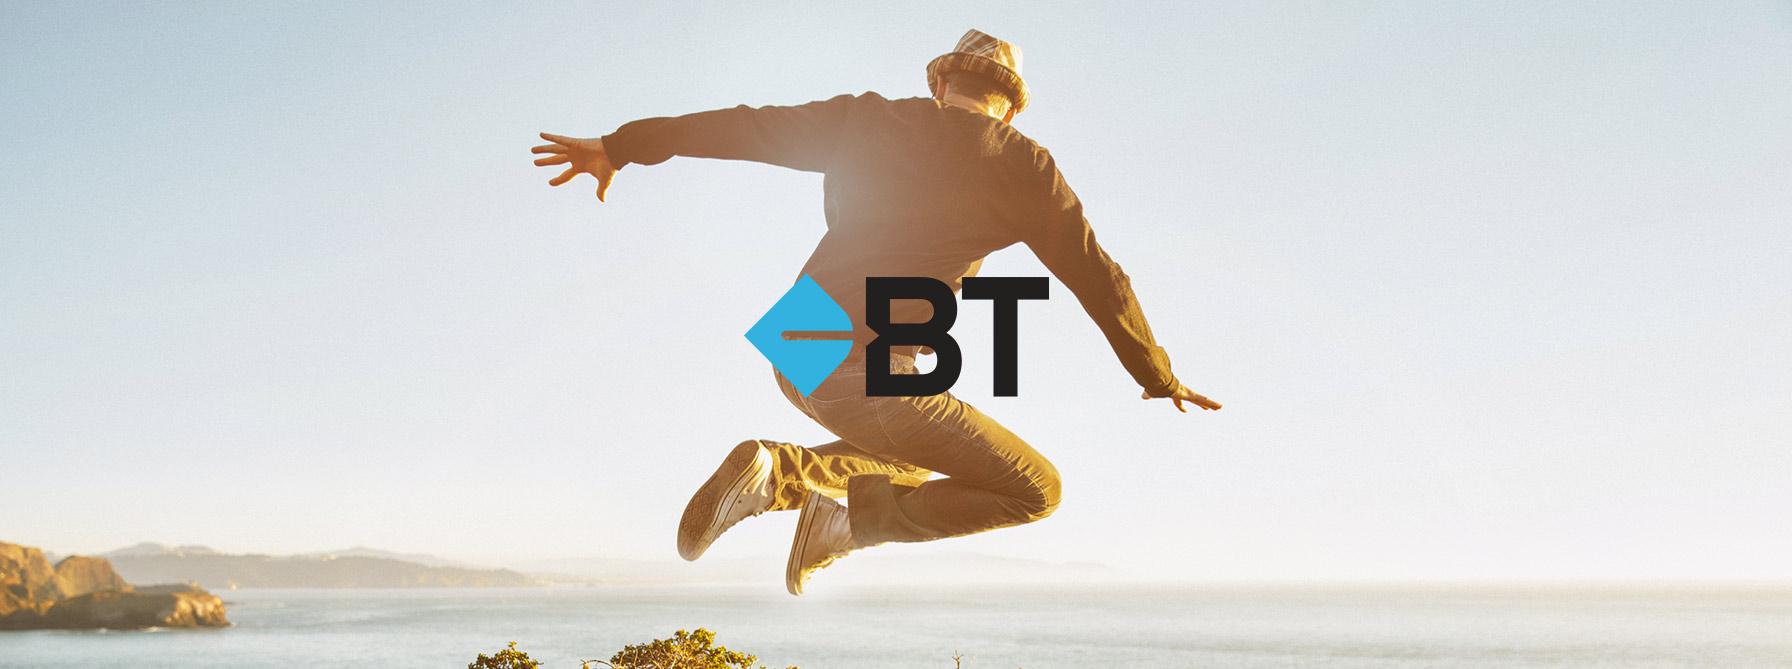 client_bt_banner header